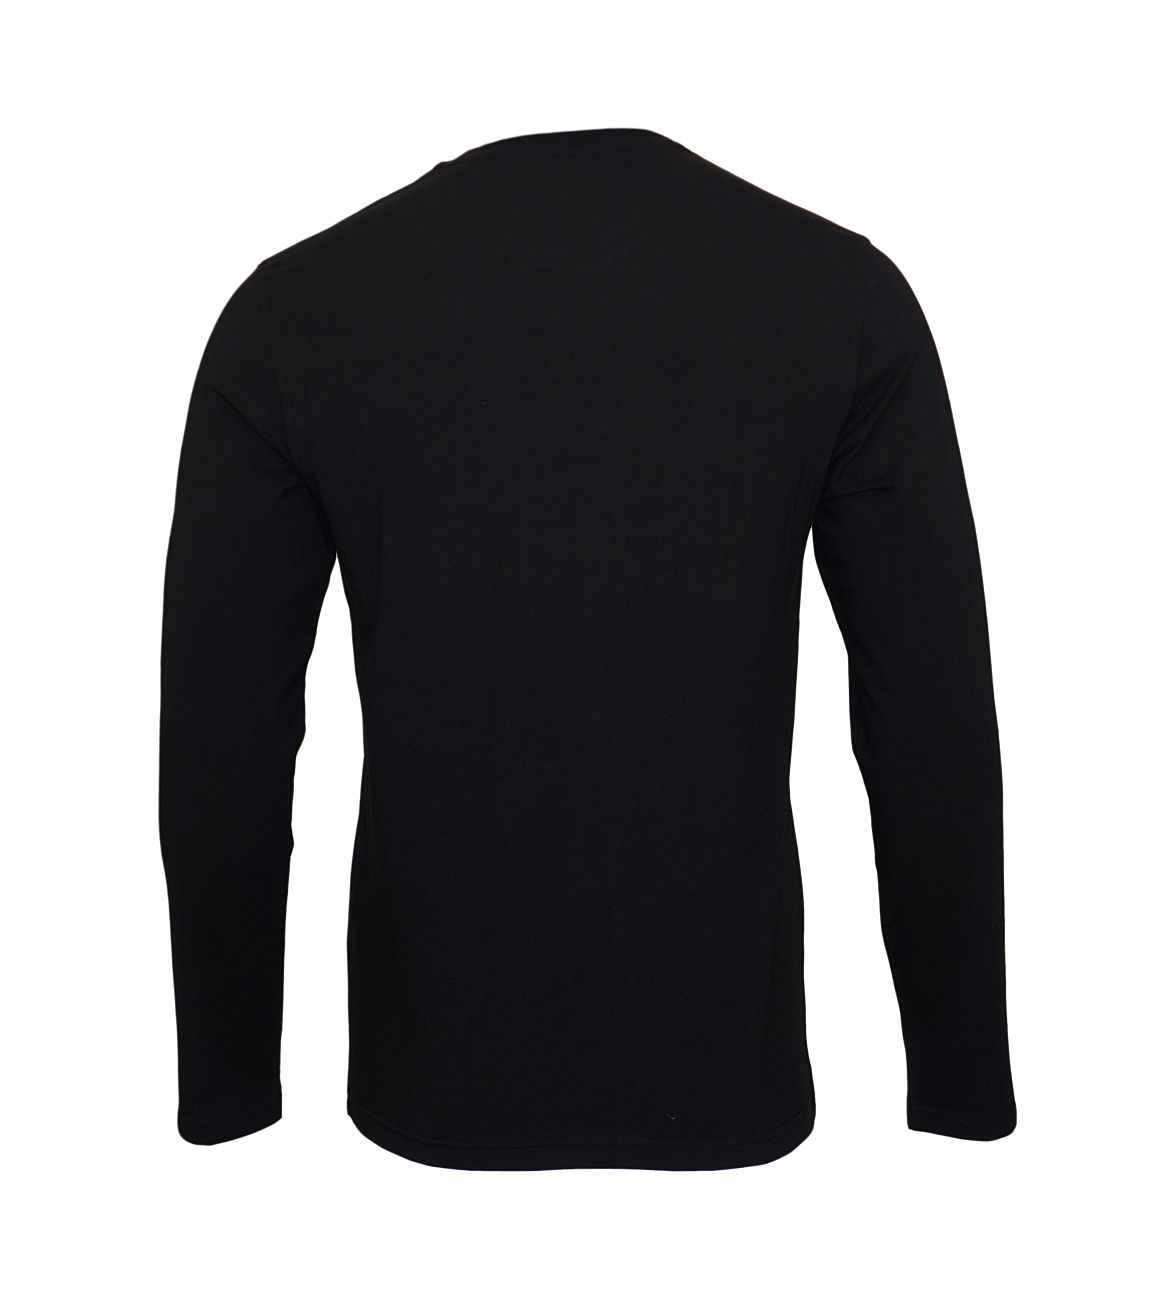 Emporio Armani Longsleeve Rundhals Shirt 111653 8A720 00020 NERO WX18-EAX